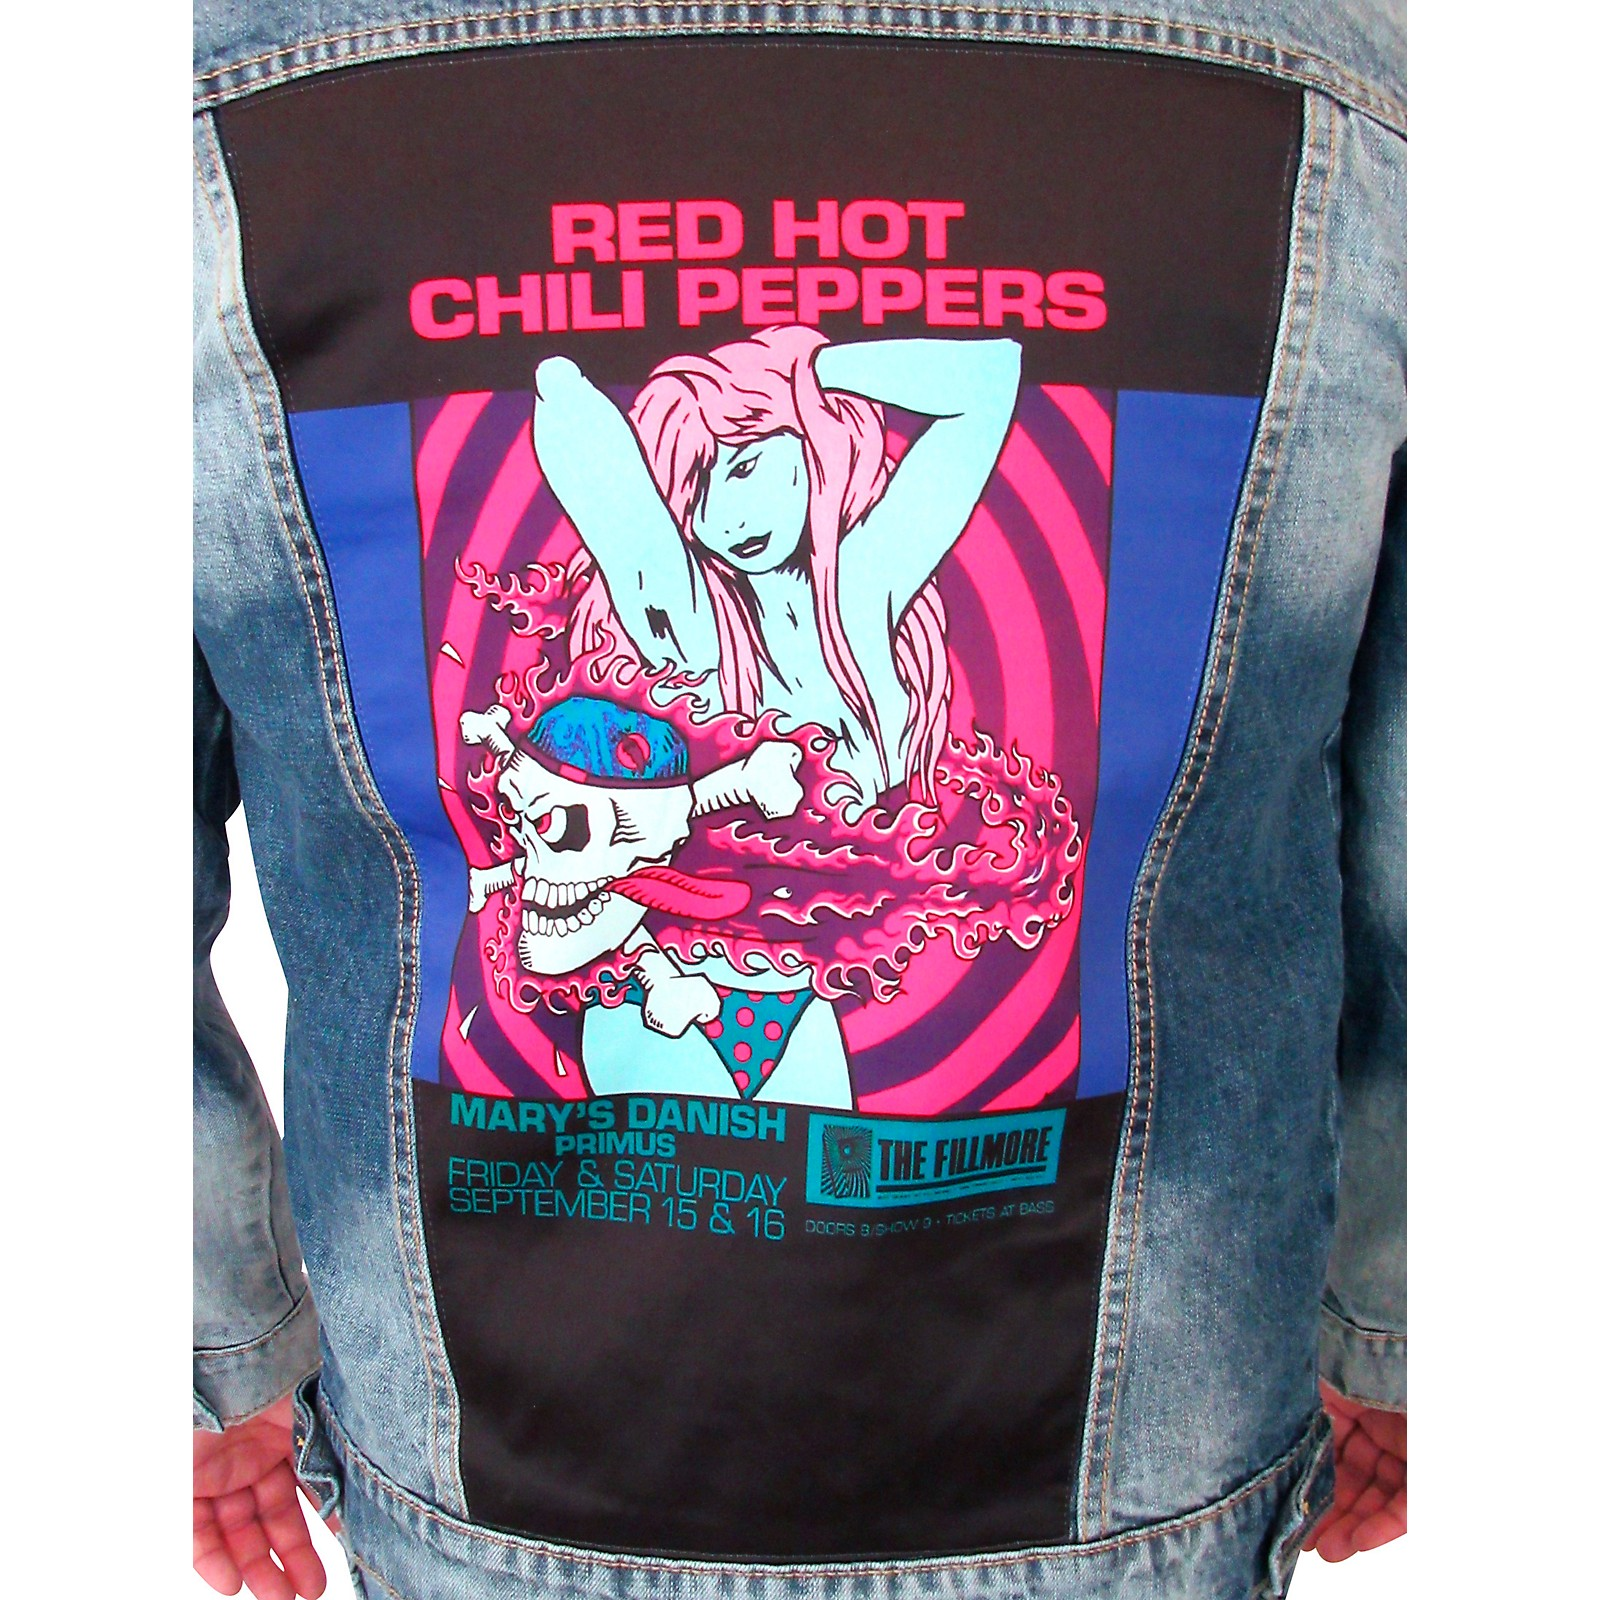 Dragonfly Clothing Red Hot Chili Peppers - Bikini Girl - Mens Denim Jacket